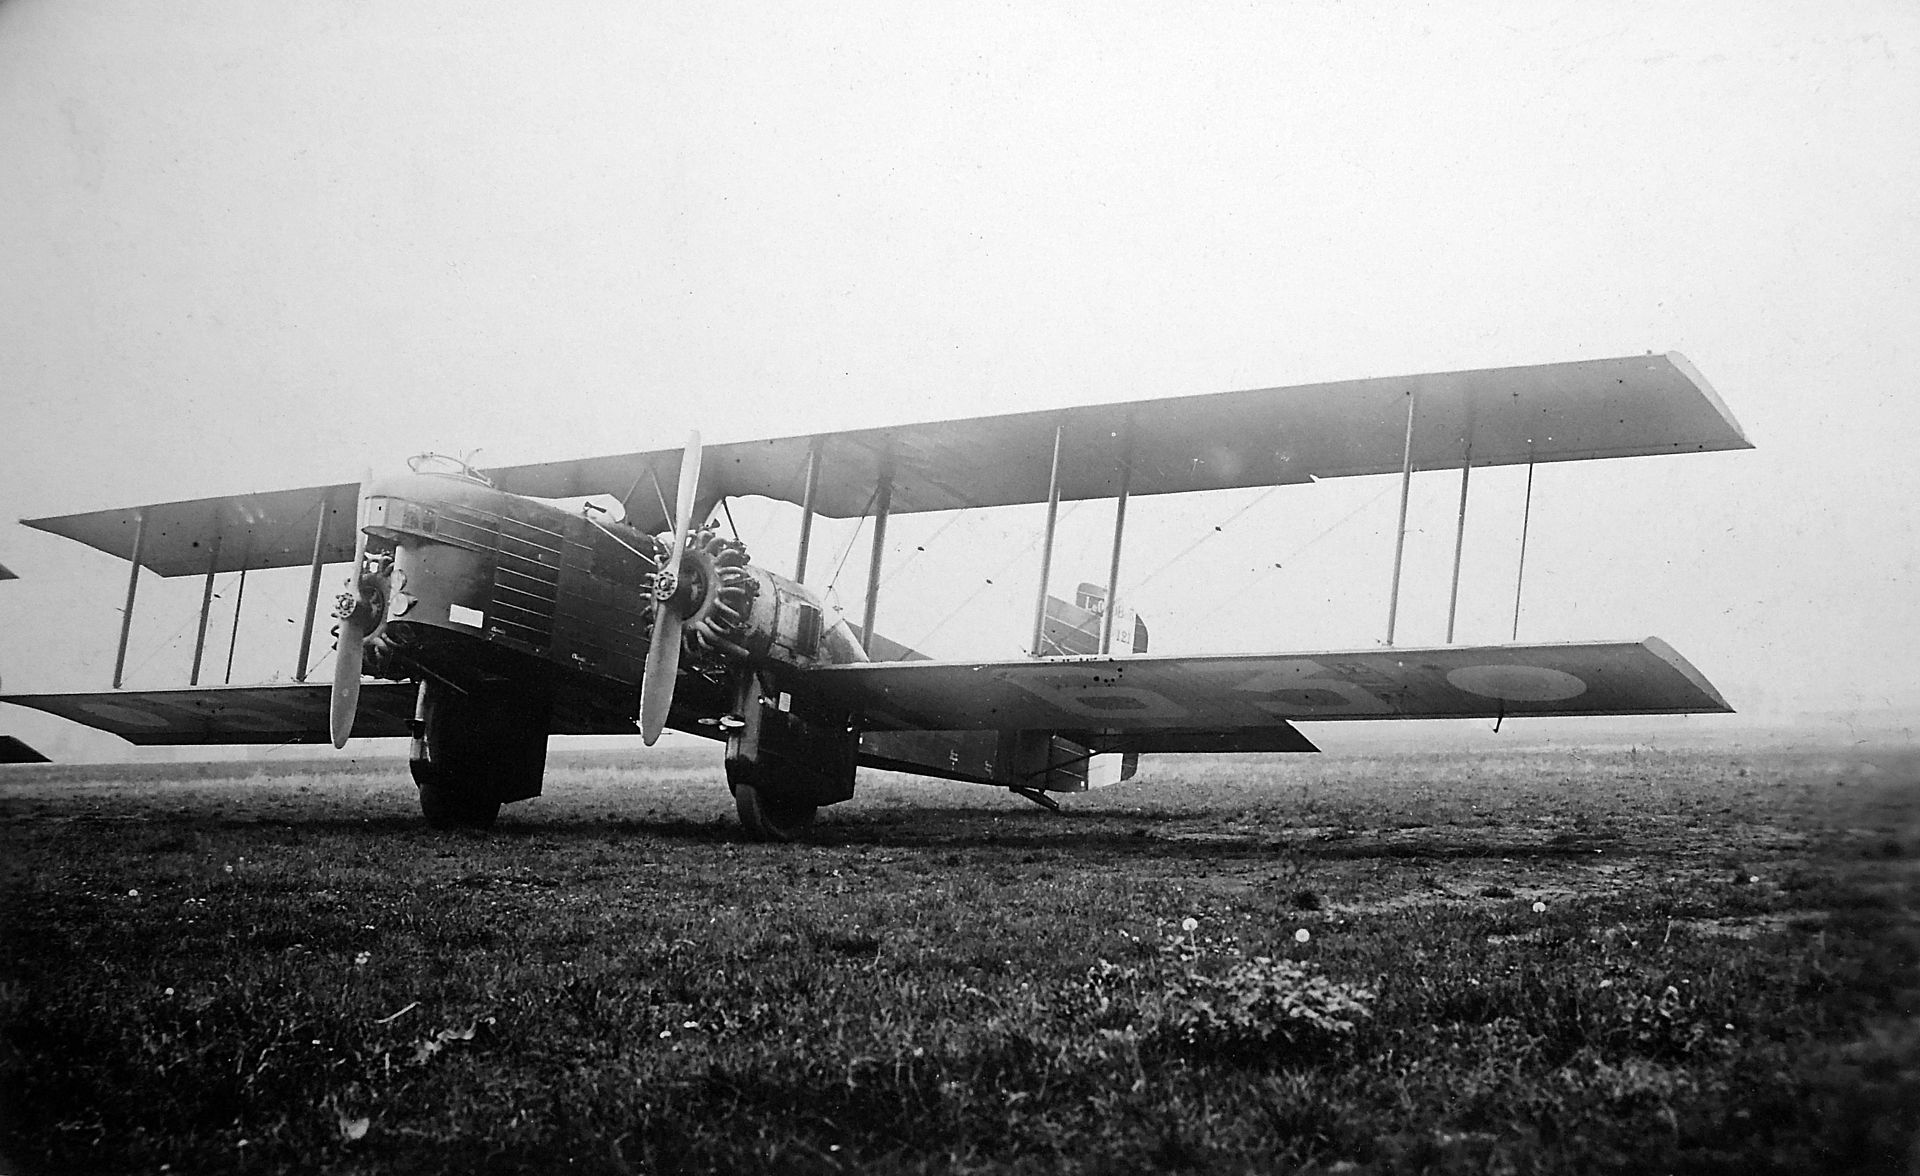 1920px-Liore_et_Olivier_LeO_20.JPG